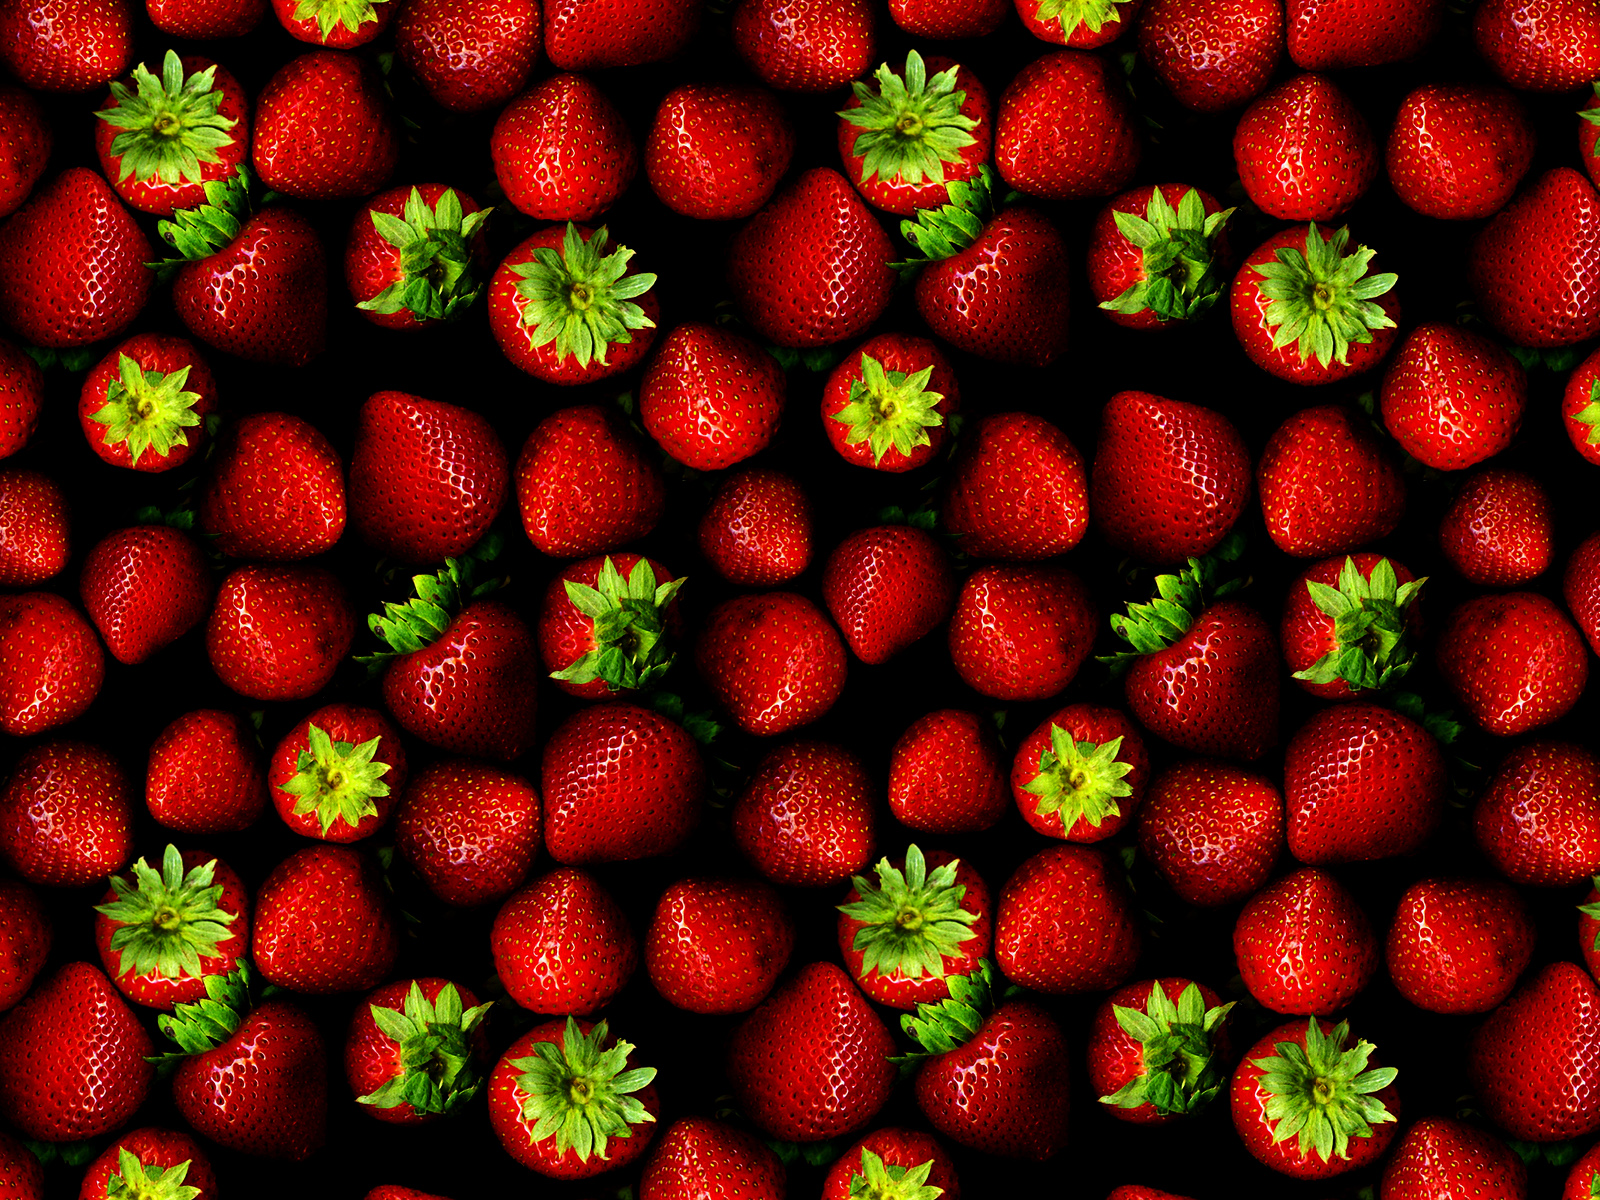 Fresh Strawberries Photography Hd Wallpapers Desktop